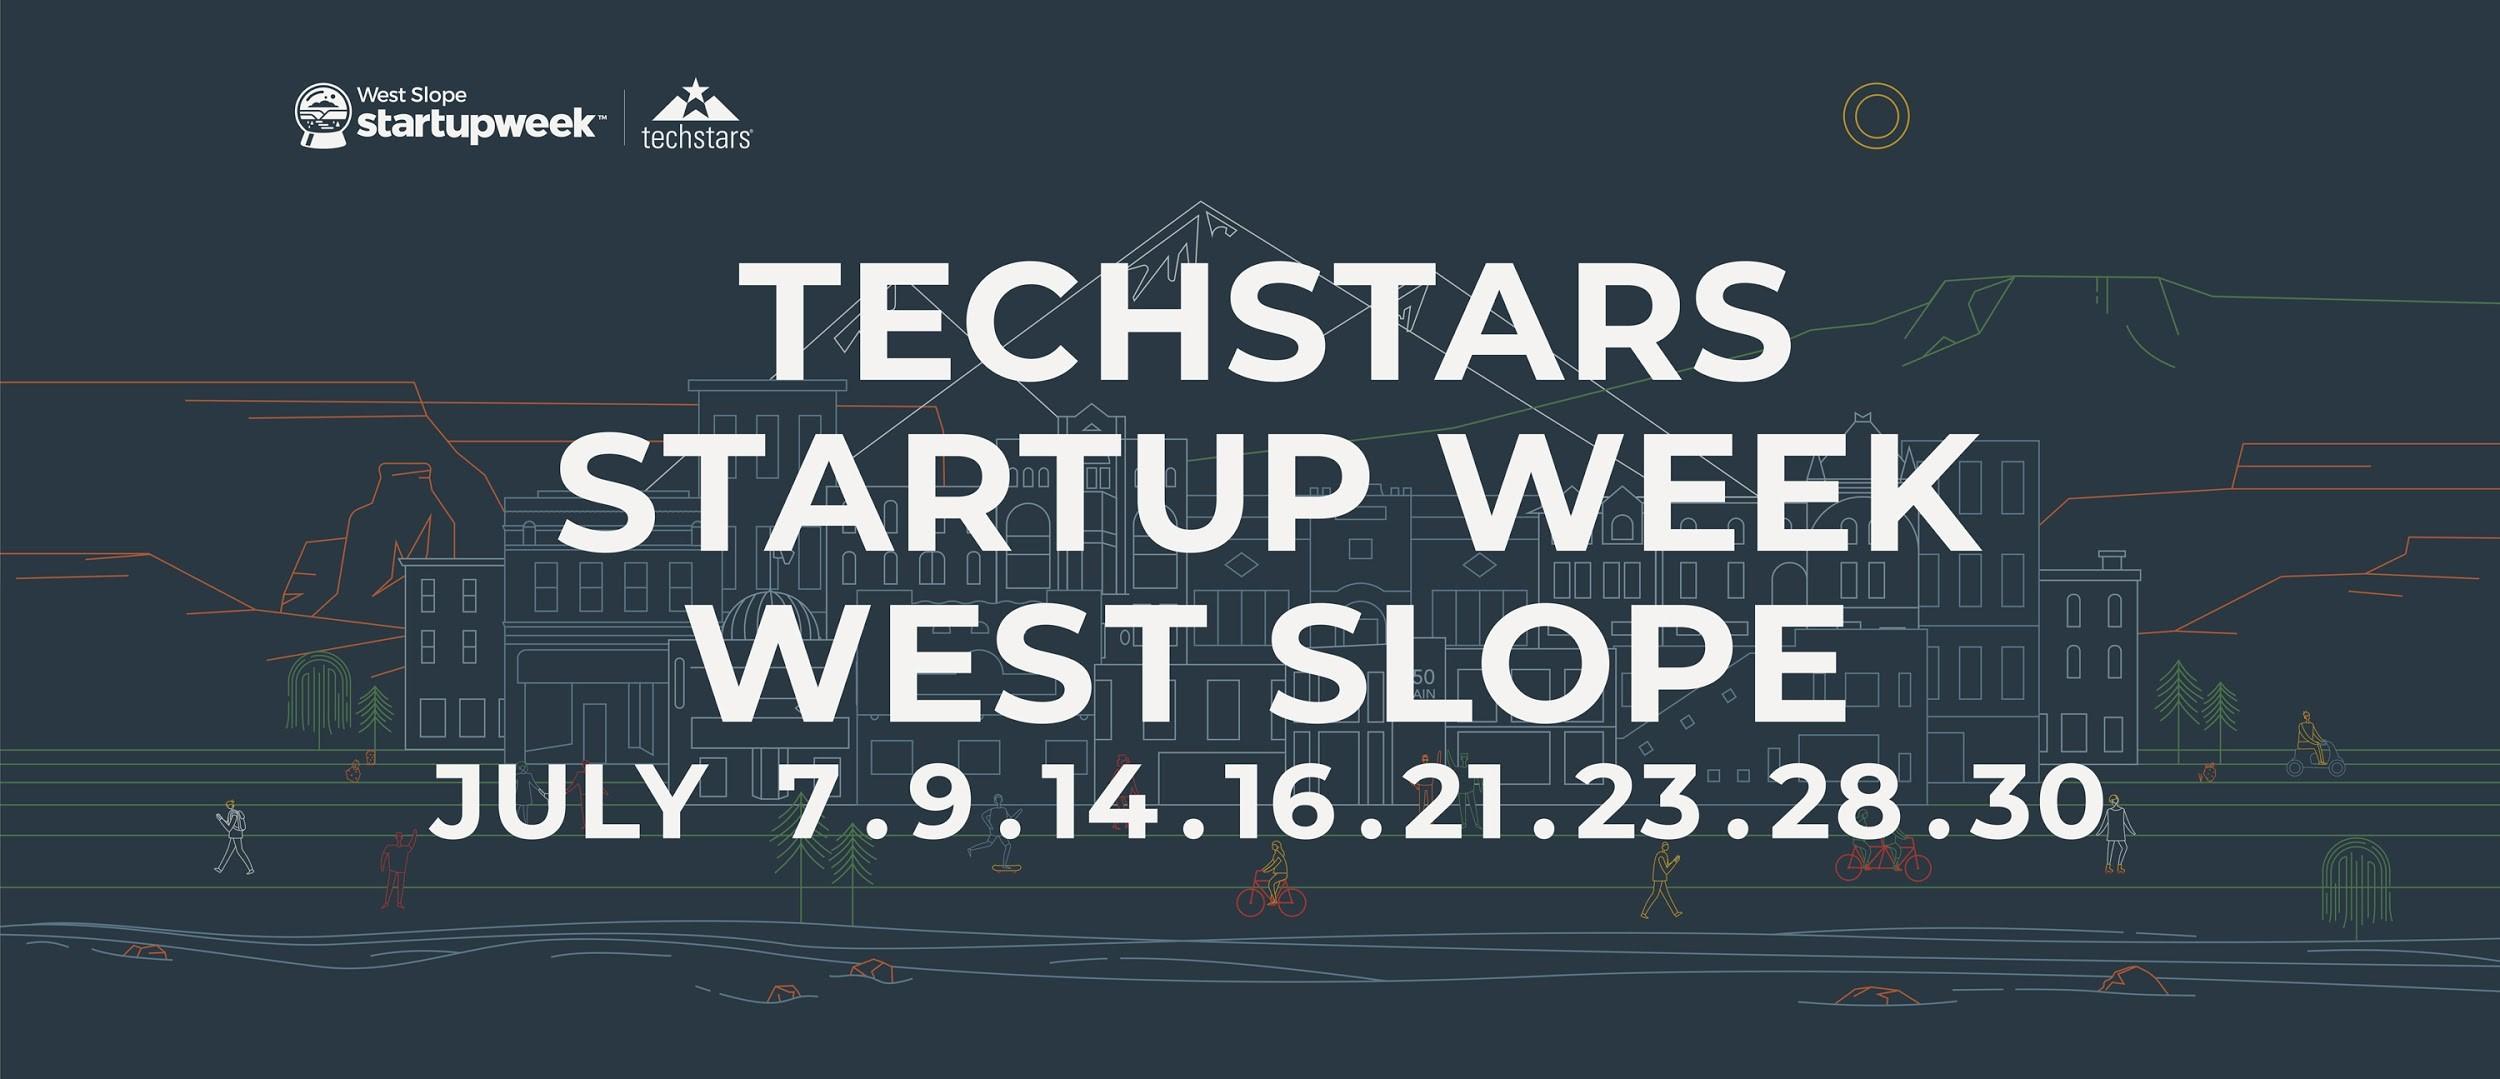 https://westslopestartupweek.com/